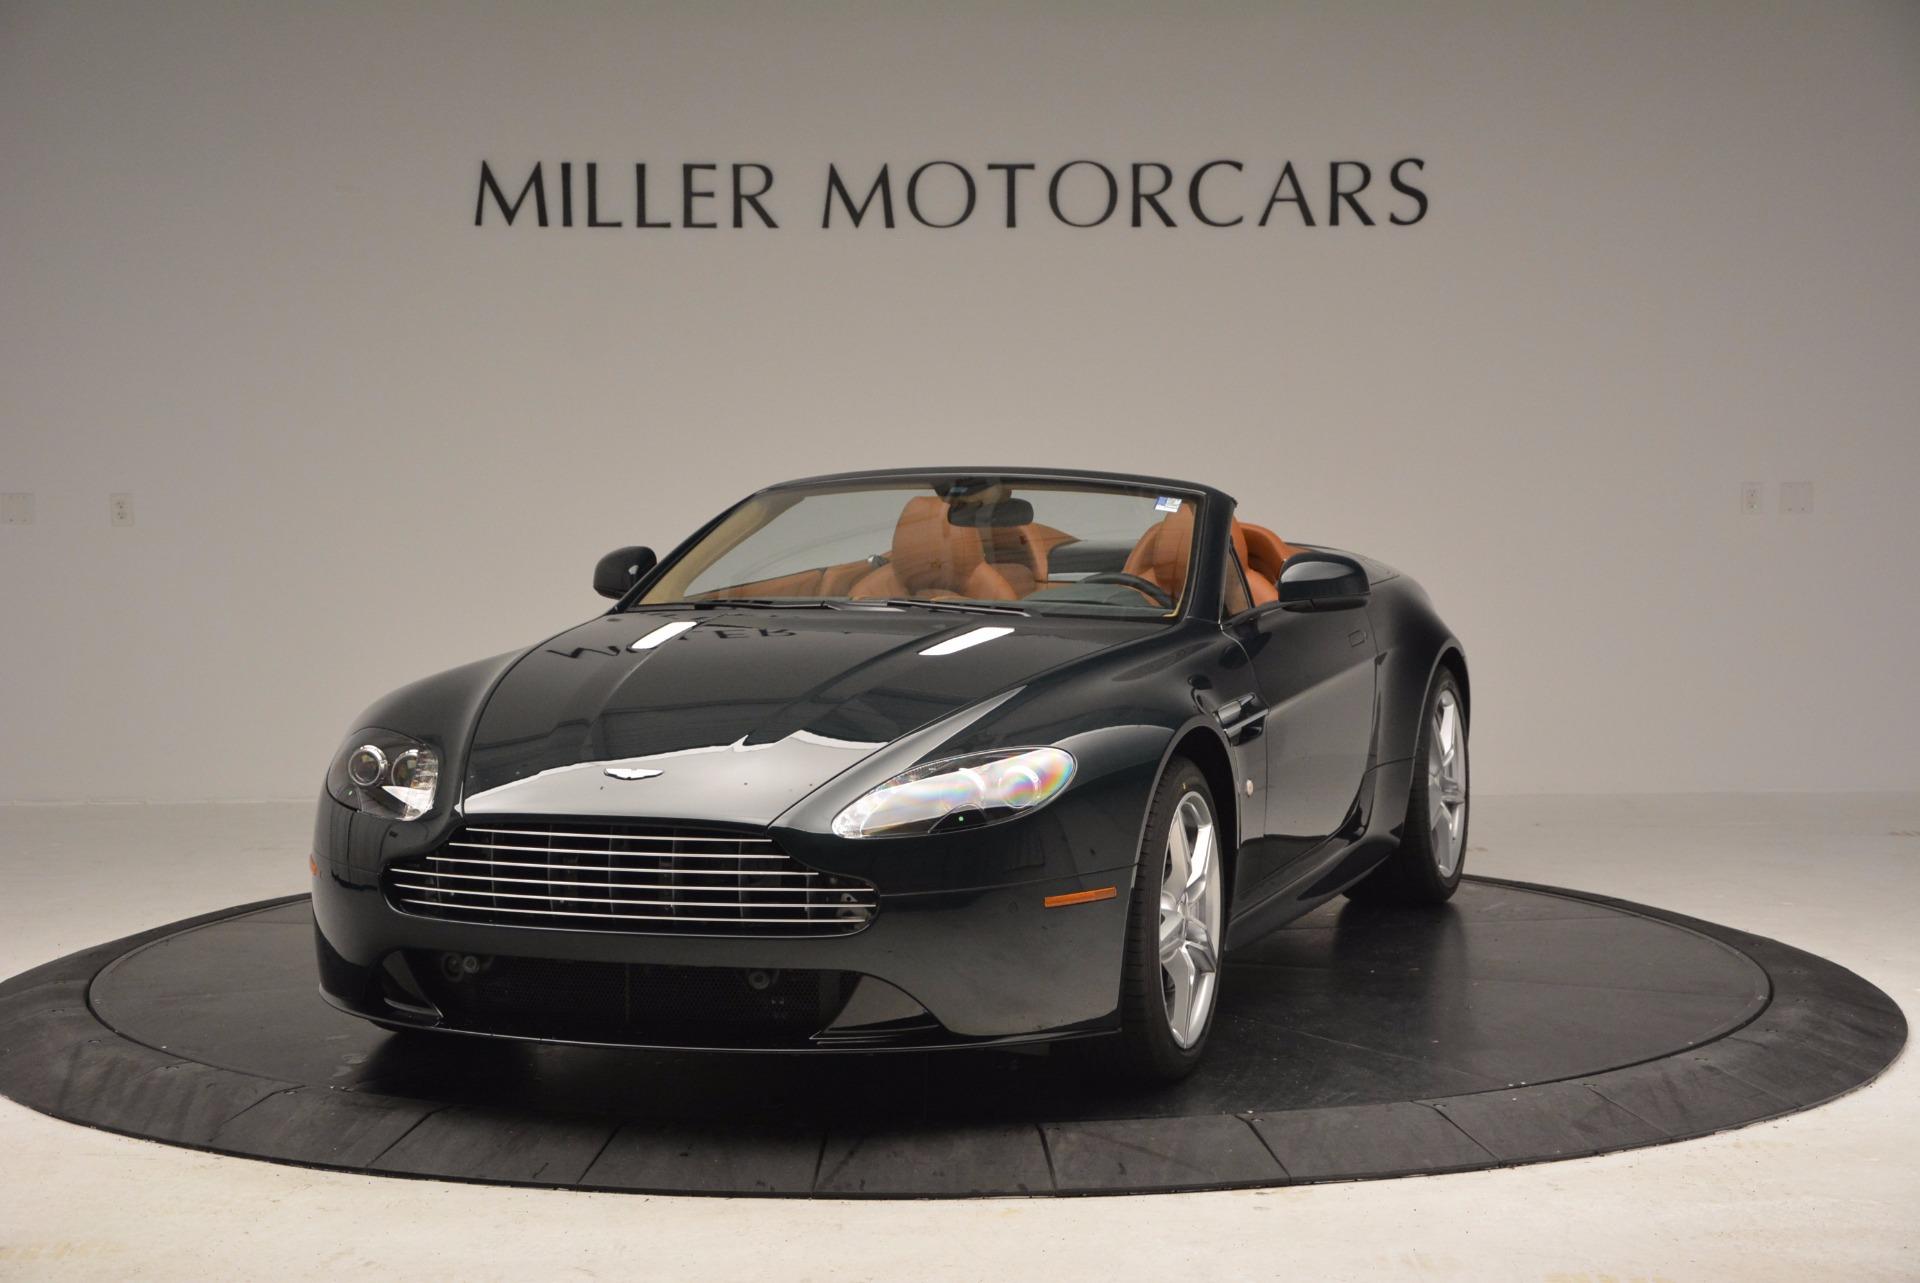 Used 2016 Aston Martin V8 Vantage S Roadster for sale Sold at Aston Martin of Greenwich in Greenwich CT 06830 1